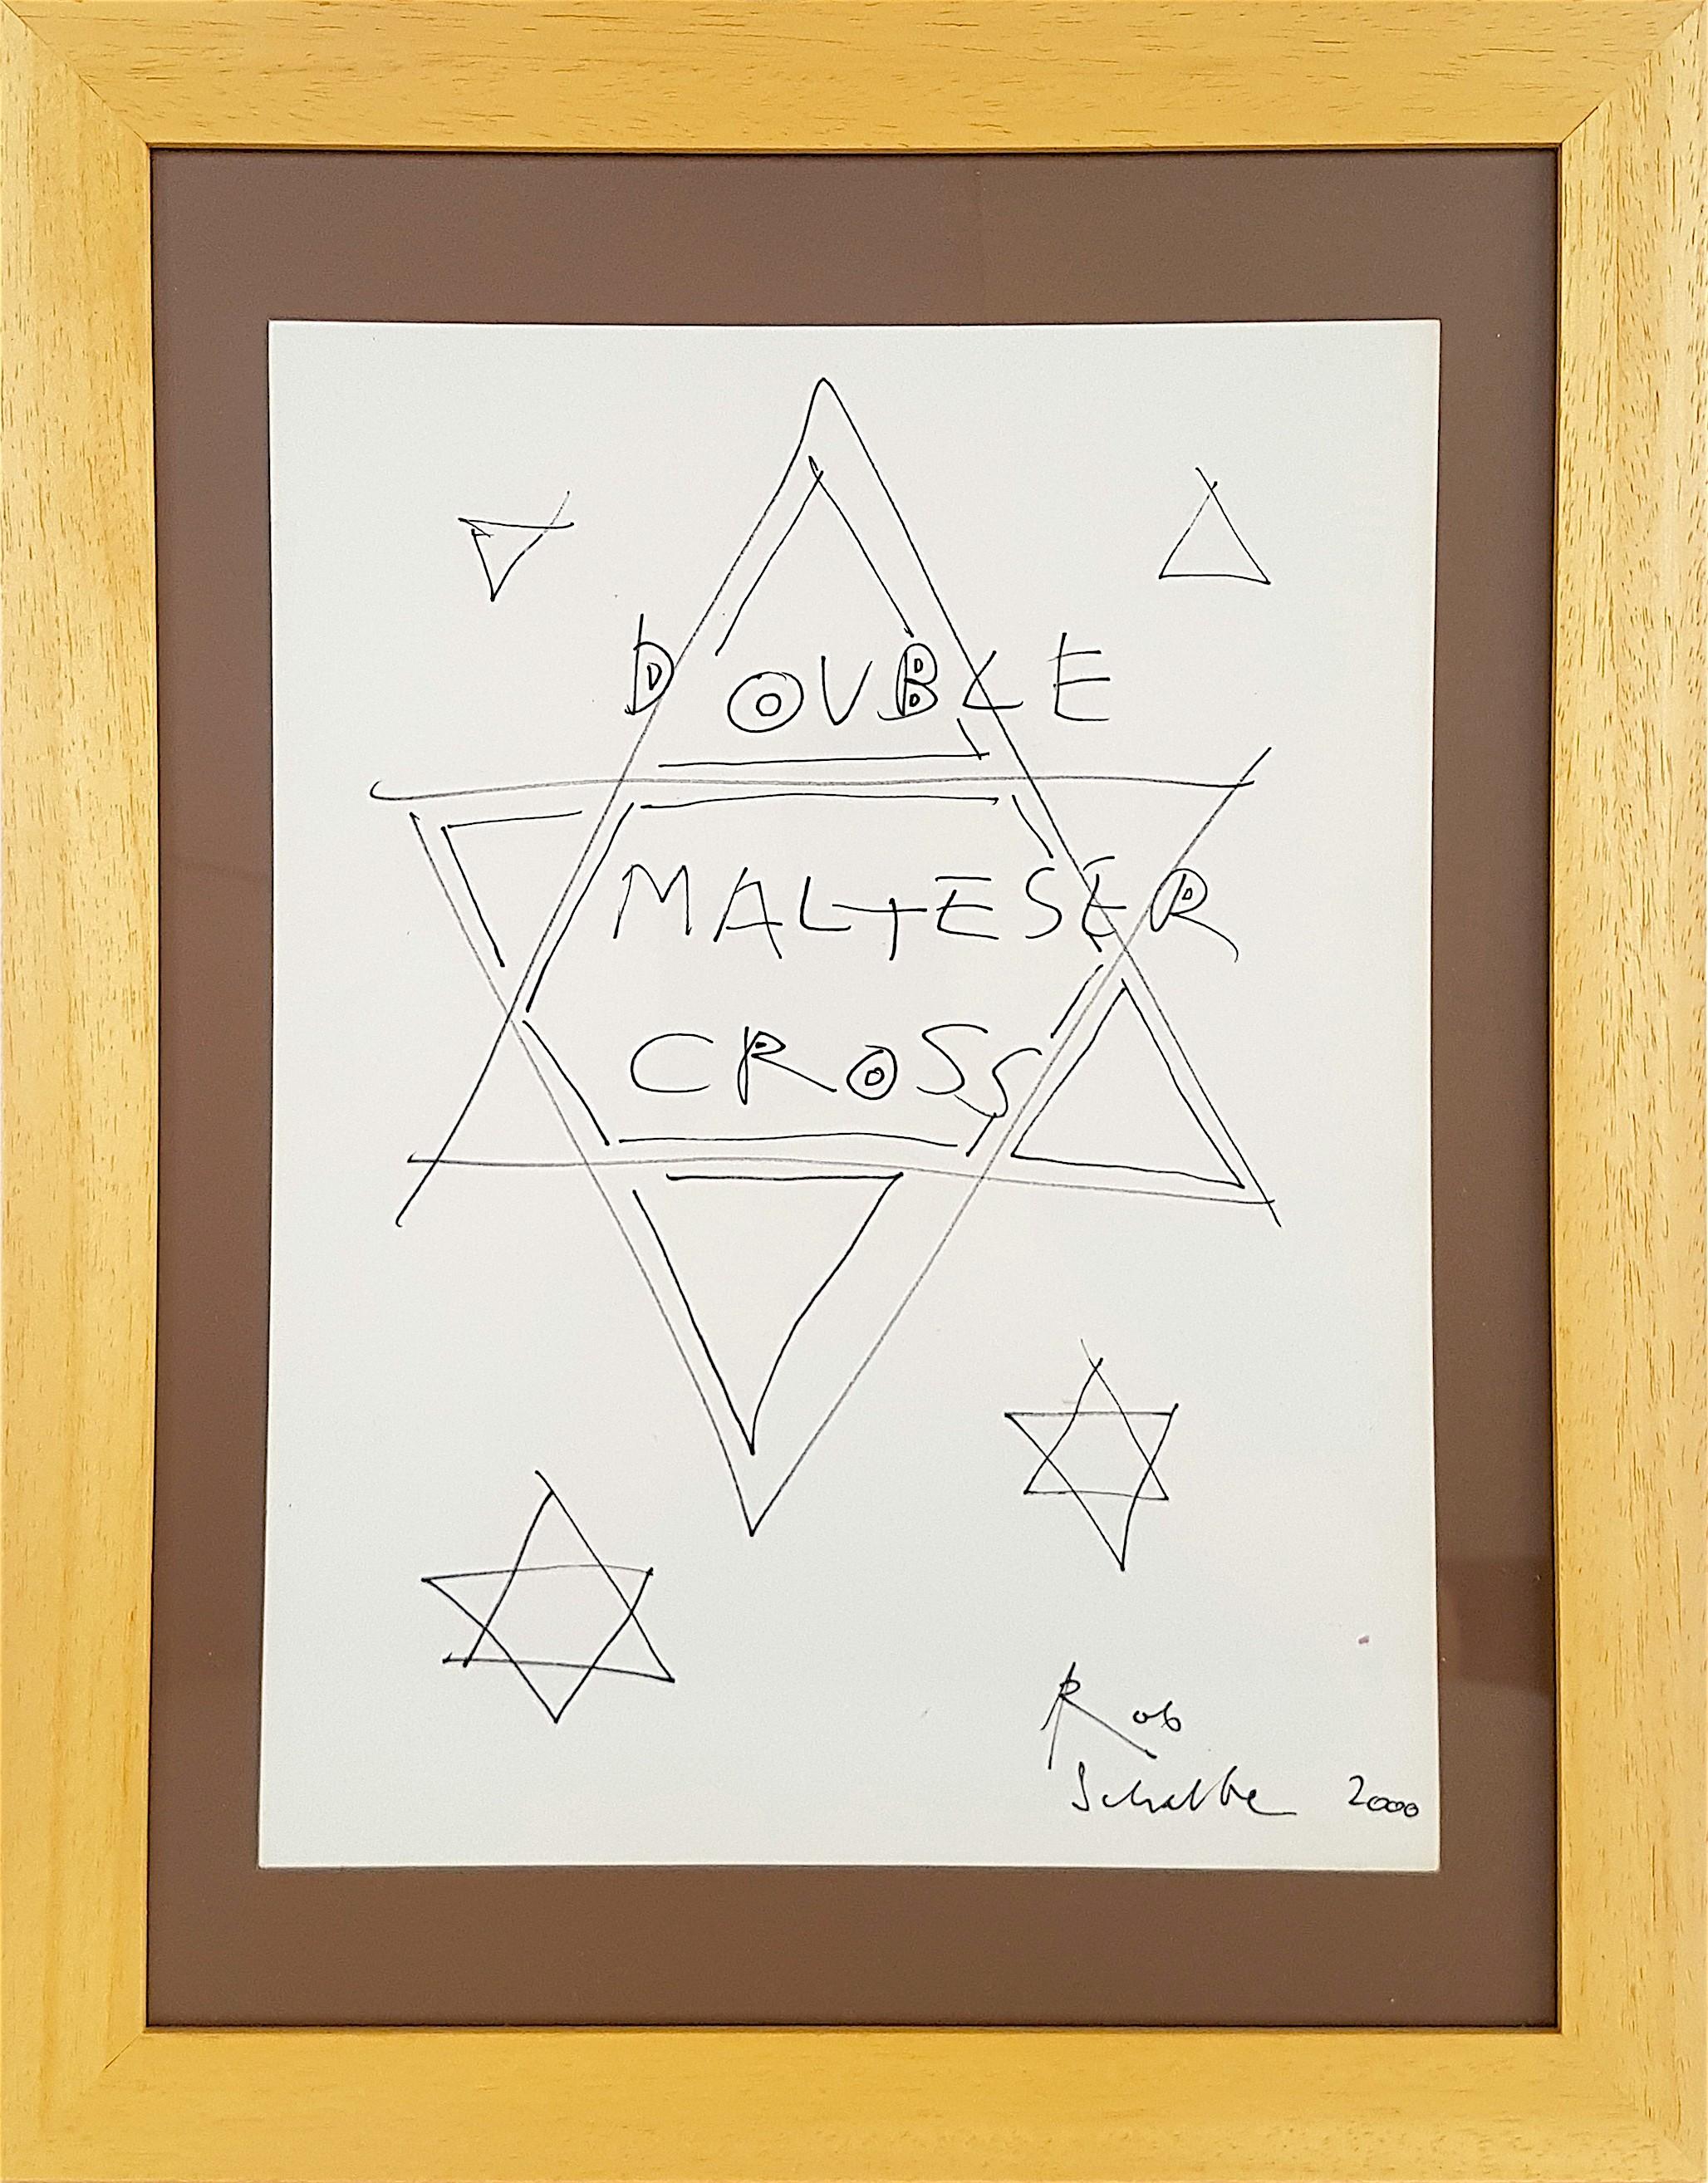 Rob Scholte – Double Malteser Cross